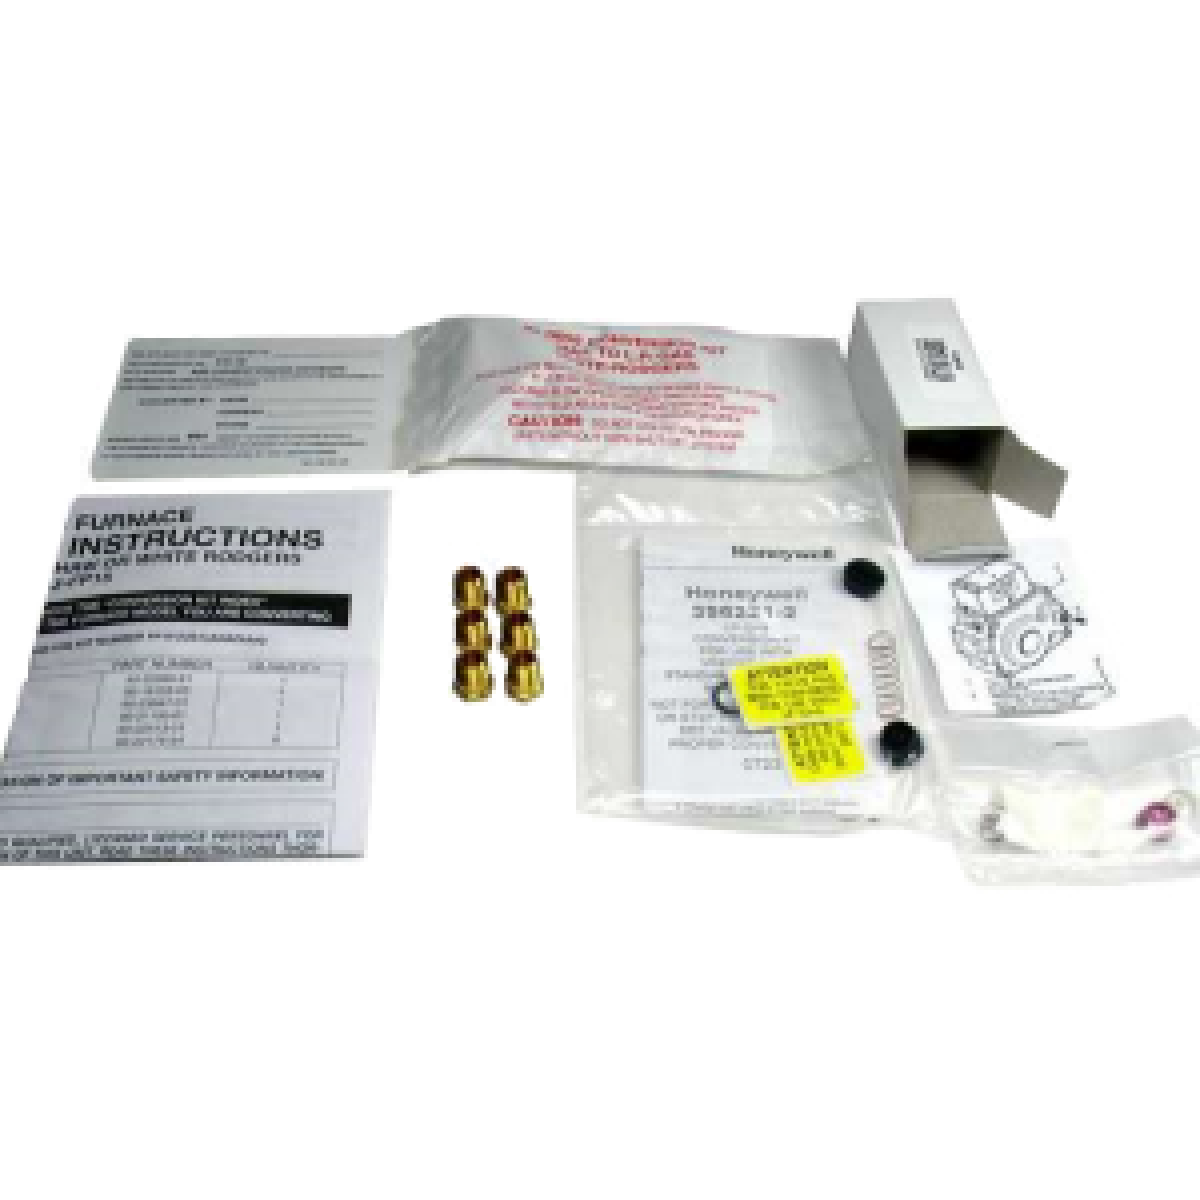 Rheem Fp 15 Propane Conversion Kit For 80 Furnaces